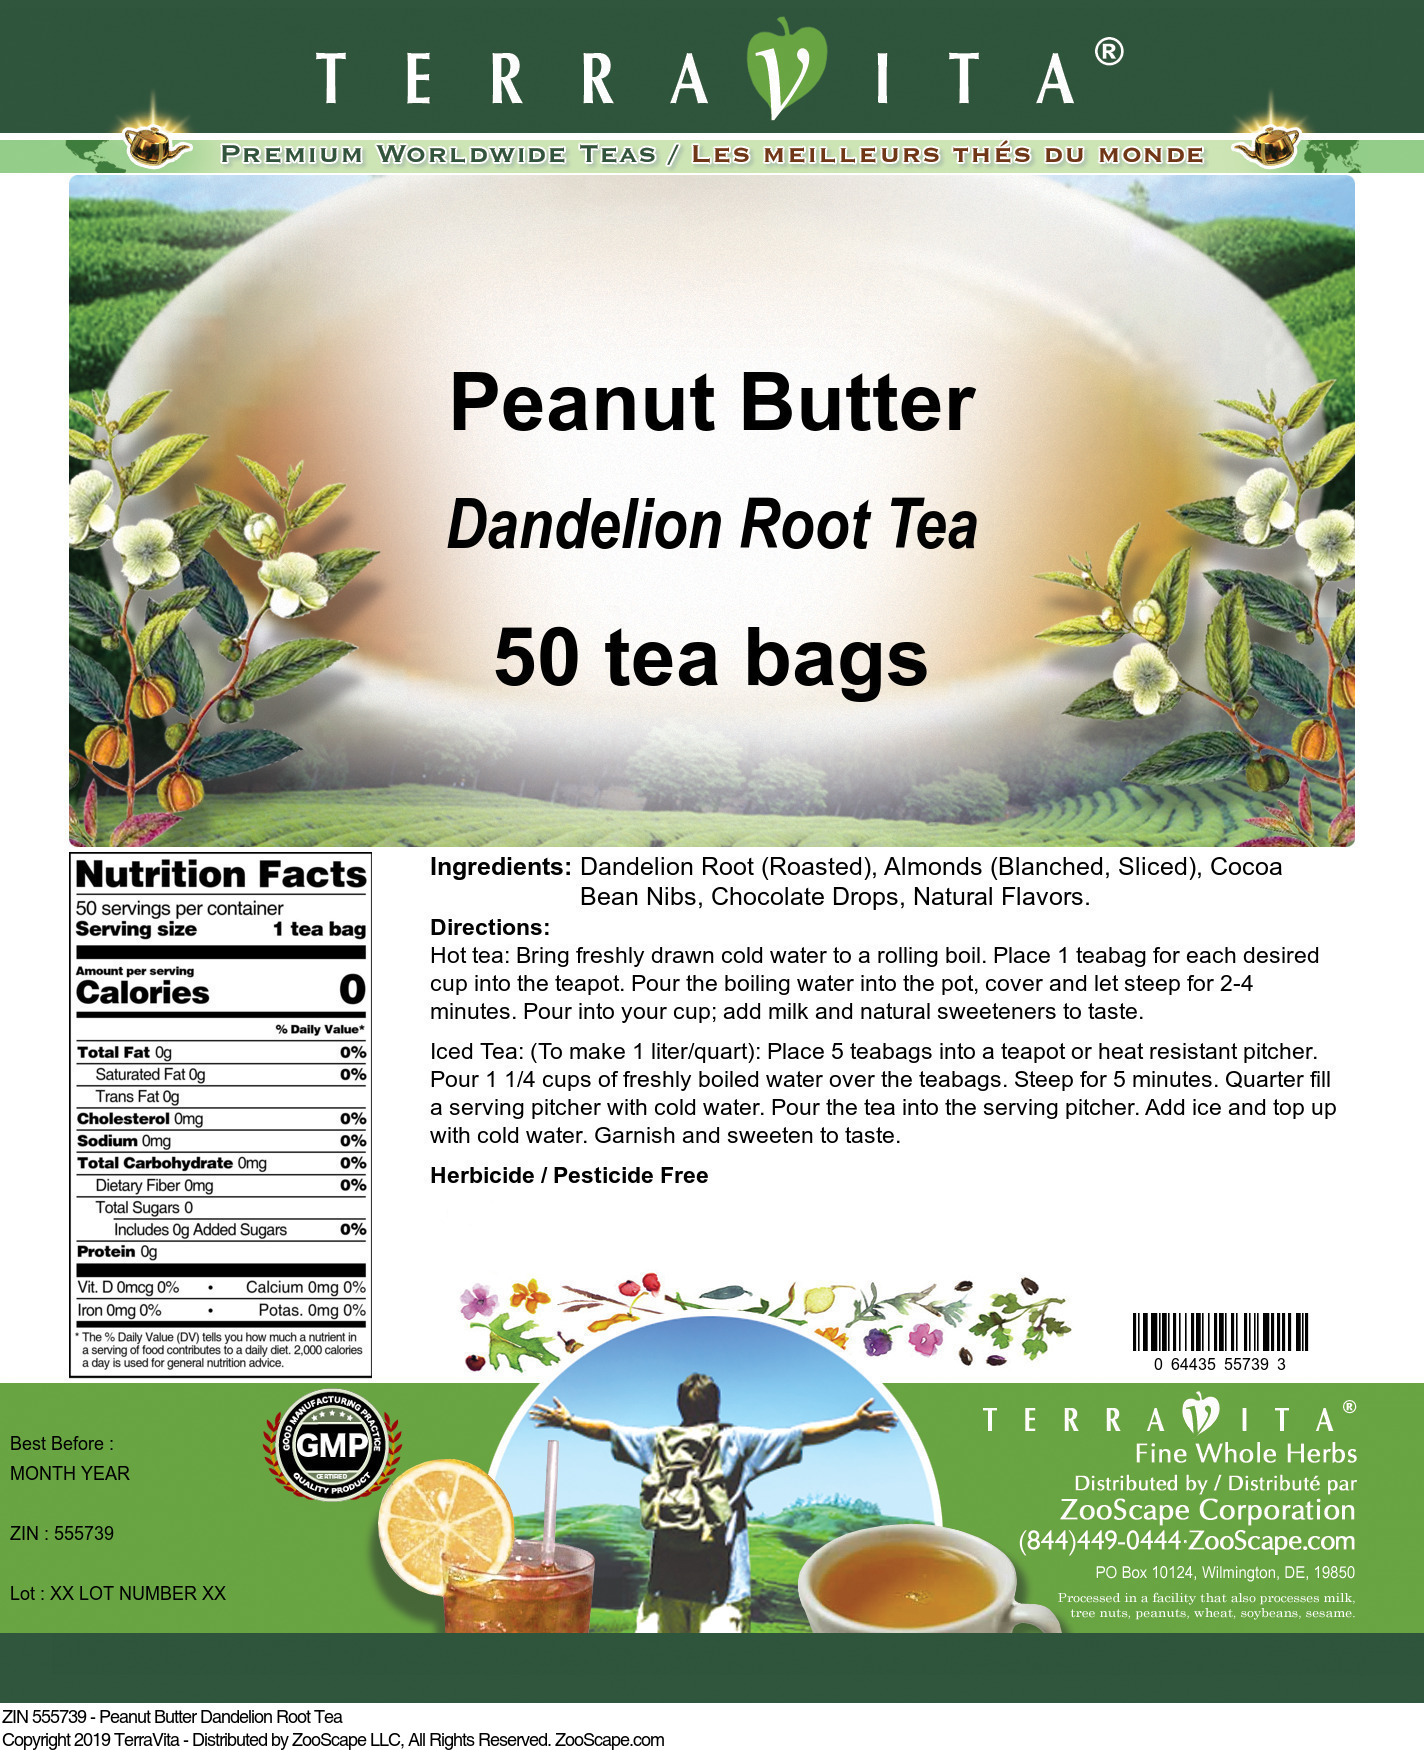 Peanut Butter Dandelion Root Tea